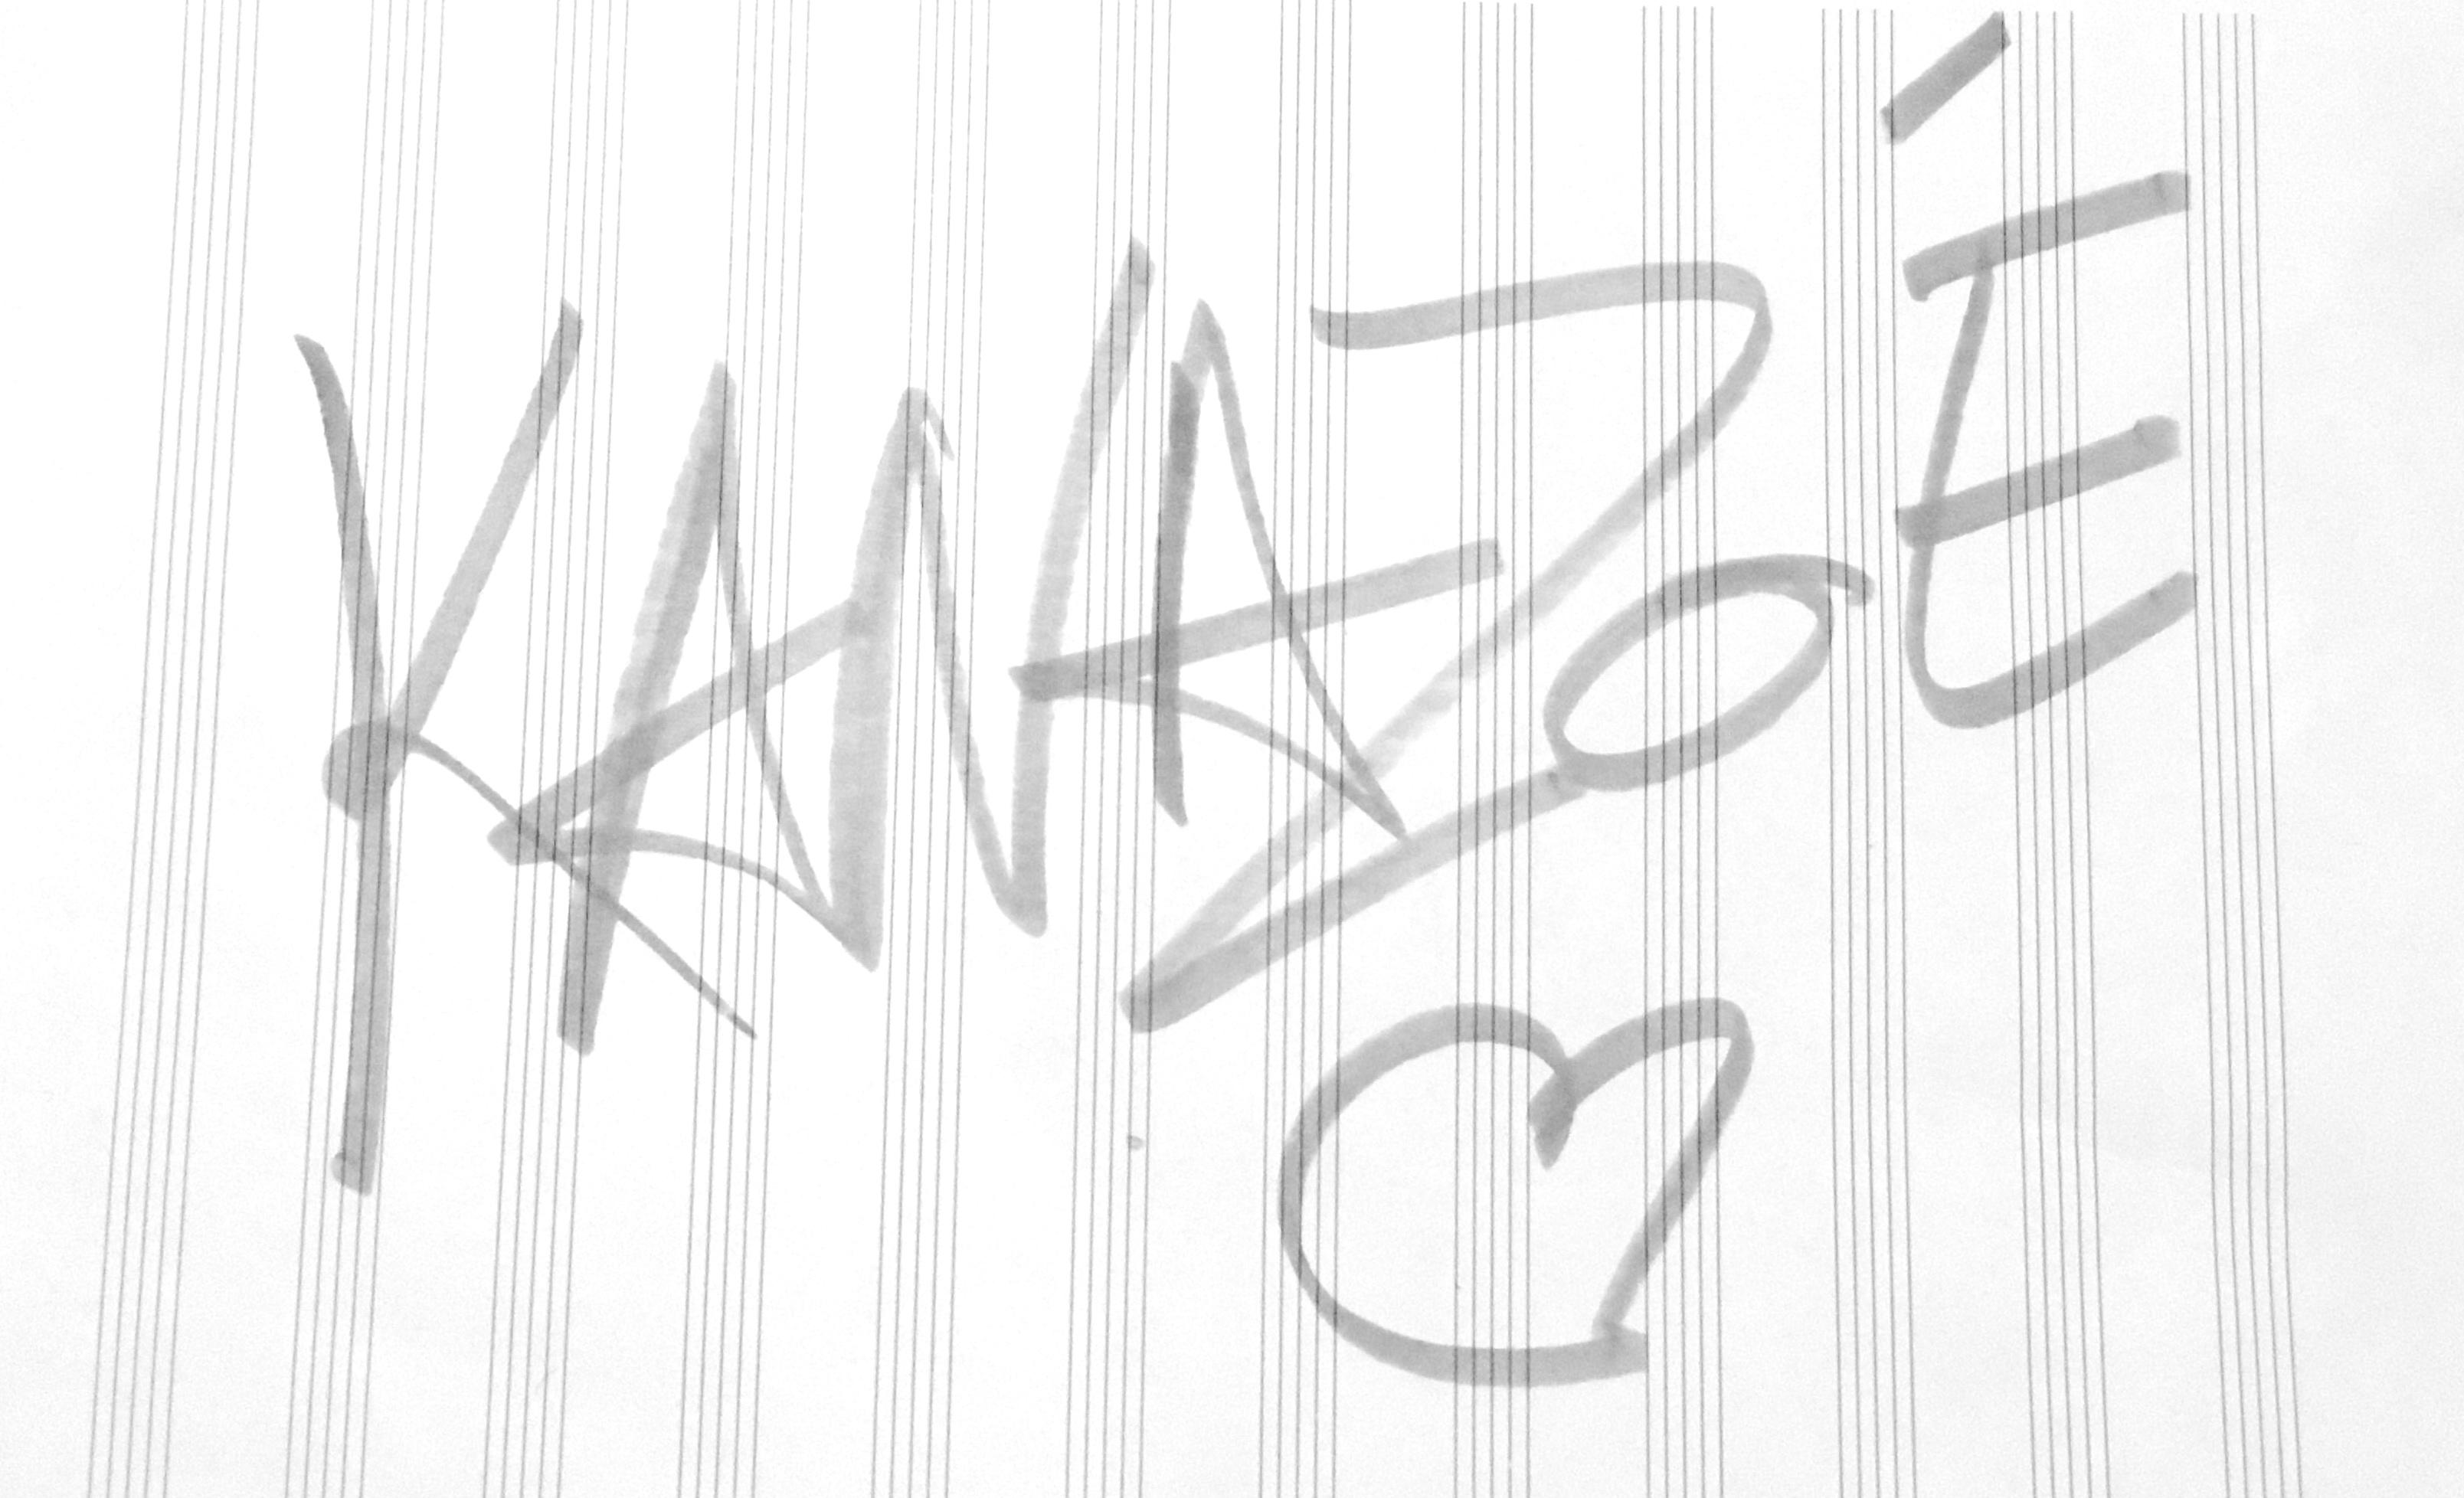 Signature_Kanazoe_-1461227389.jpg